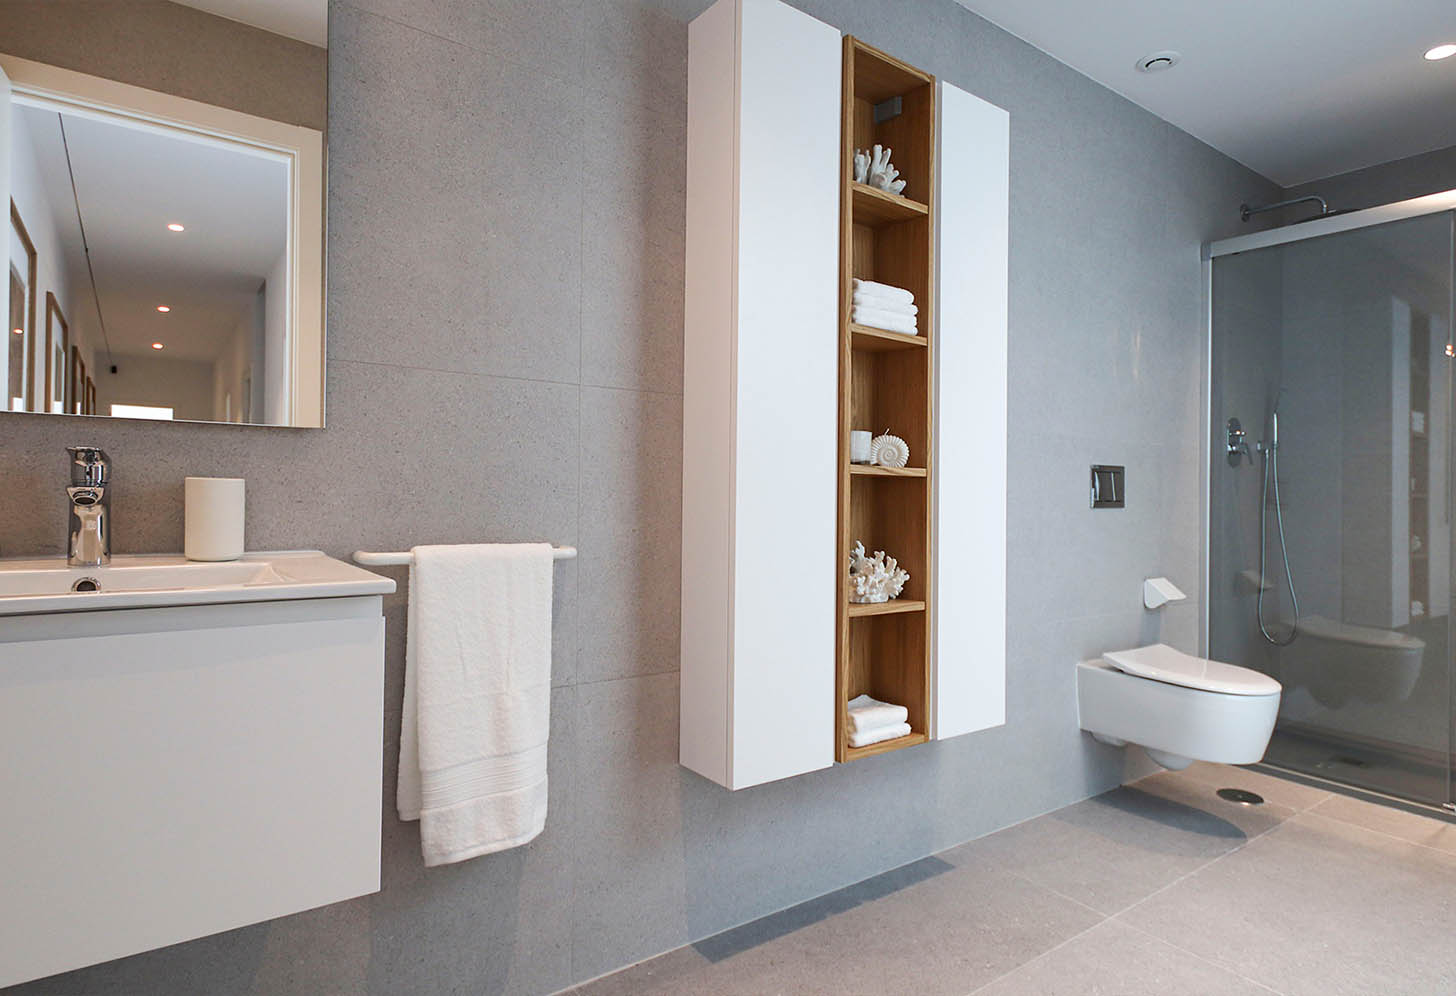 immobilier neuf espagne costa blanca on-3b essence duplex sdb 3